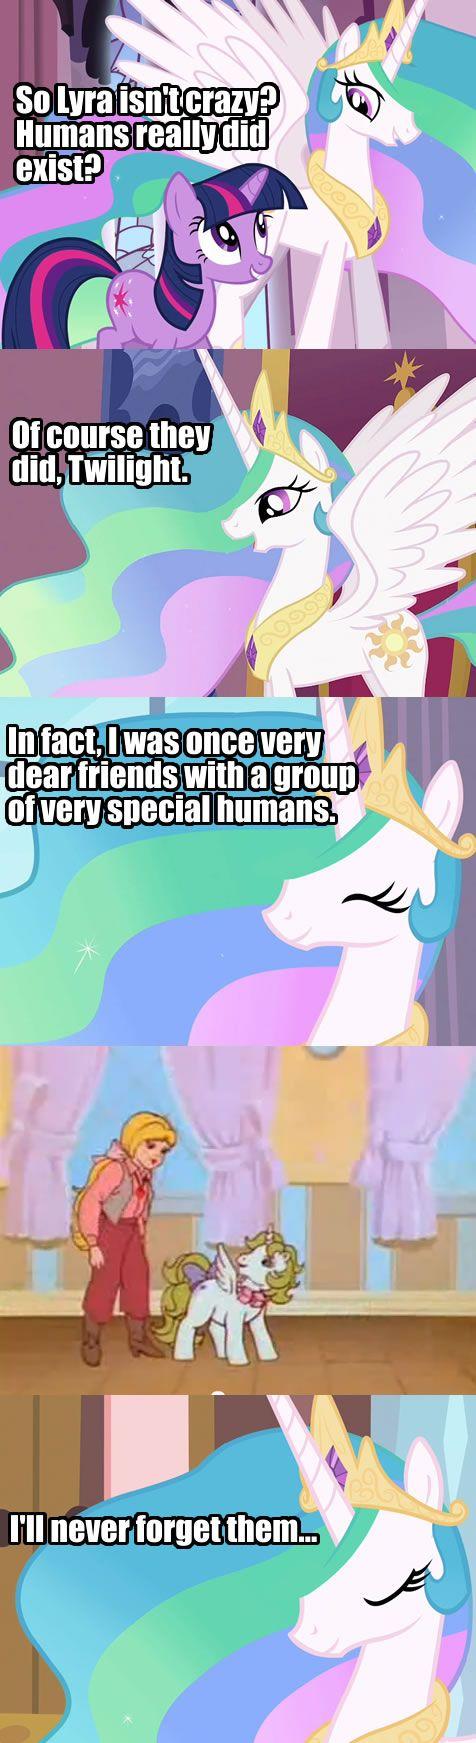 #214996 - alicorn, animation error, comic, g1, insane fan theory, megan, megan williams, princess celestia, princess surprise, safe, surprise, text, twilight sparkle - Derpibooru - My Little Pony: Friendship is Magic Imageboard